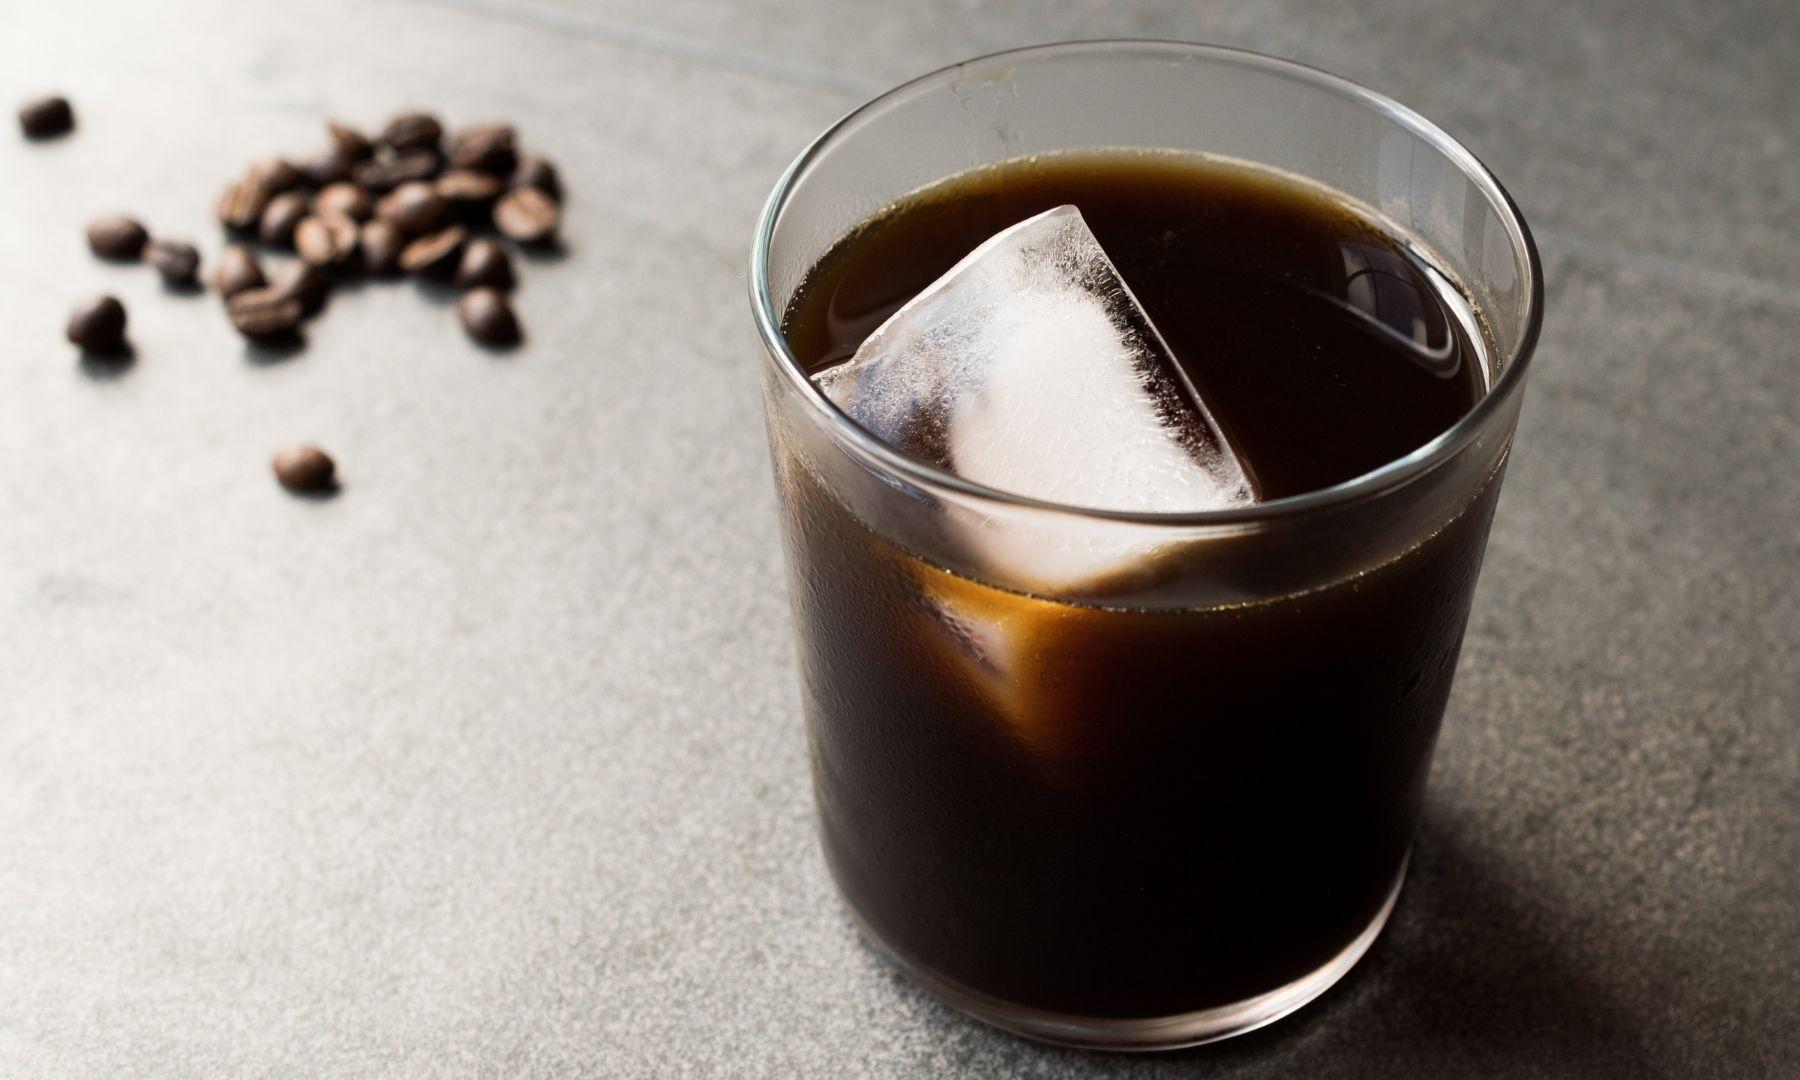 Consejos para preparar café con hielo